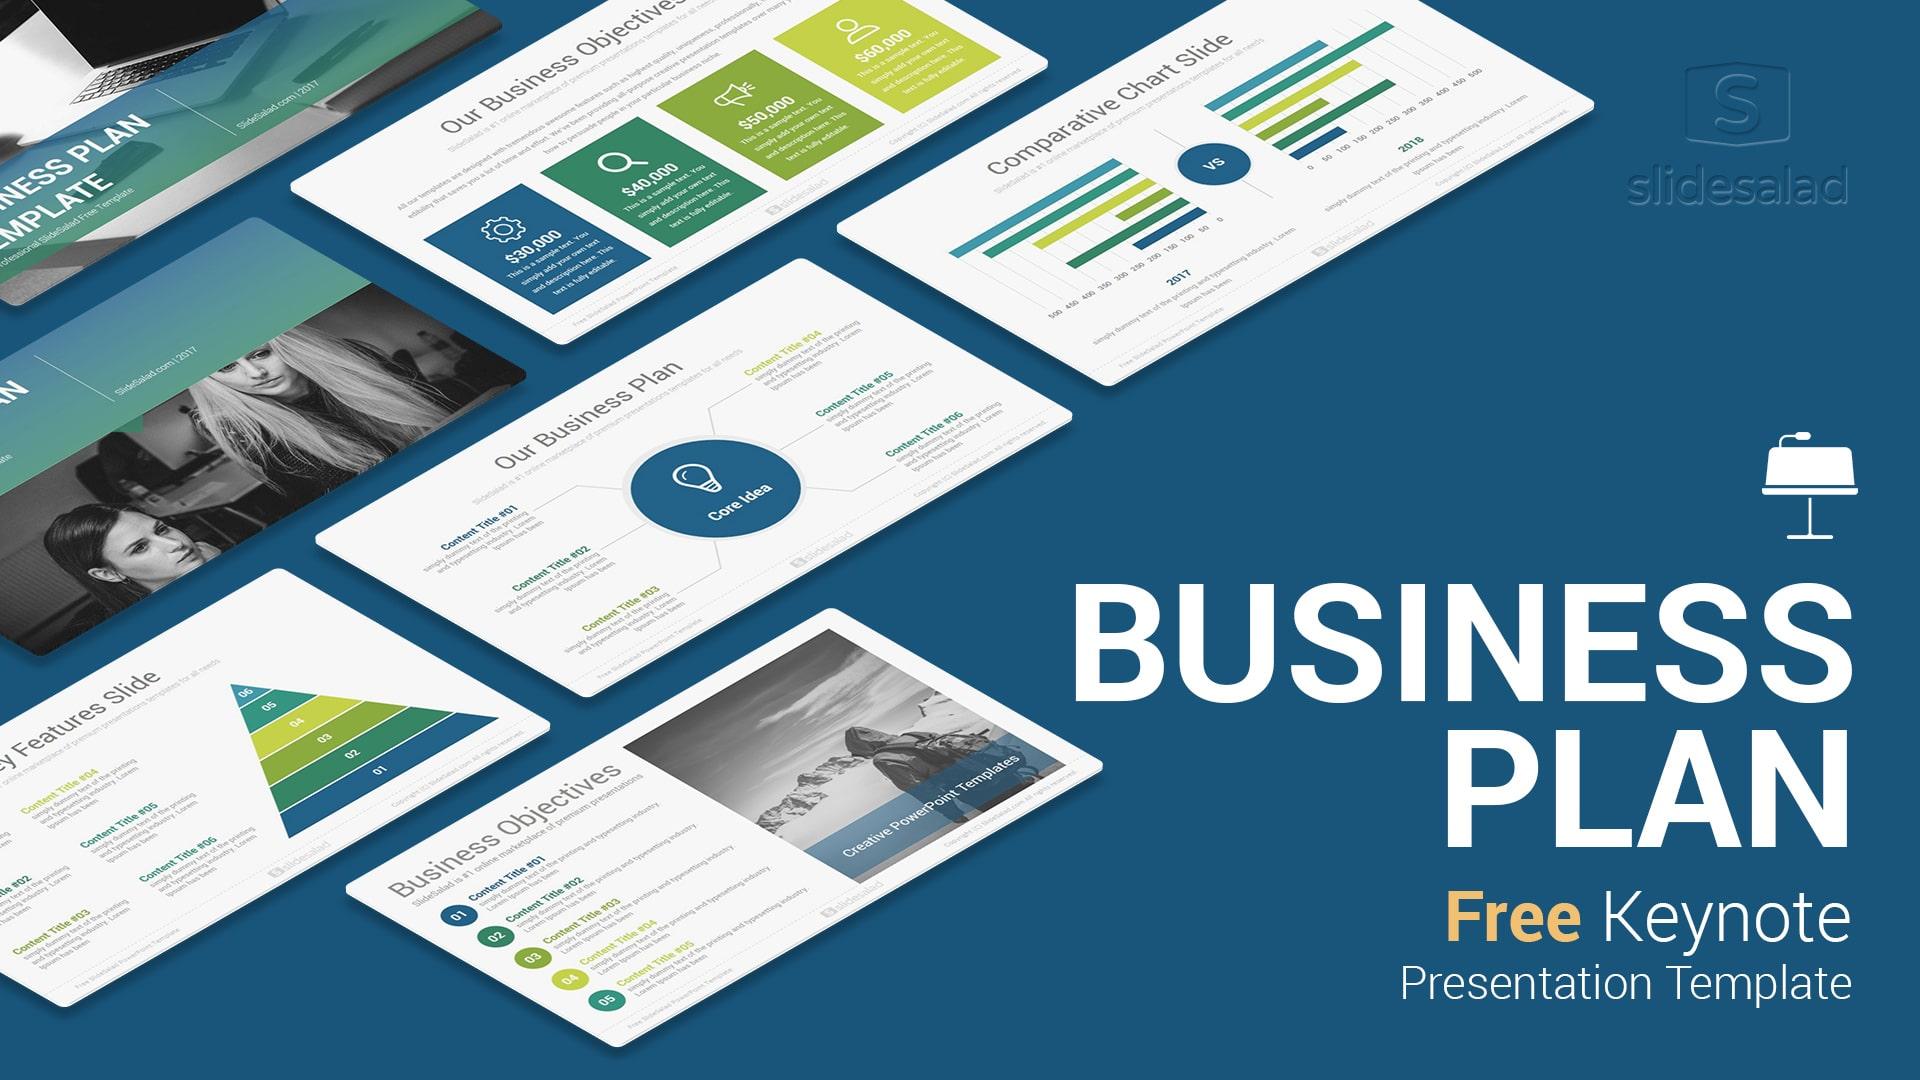 Keynote Business Plan Template Free